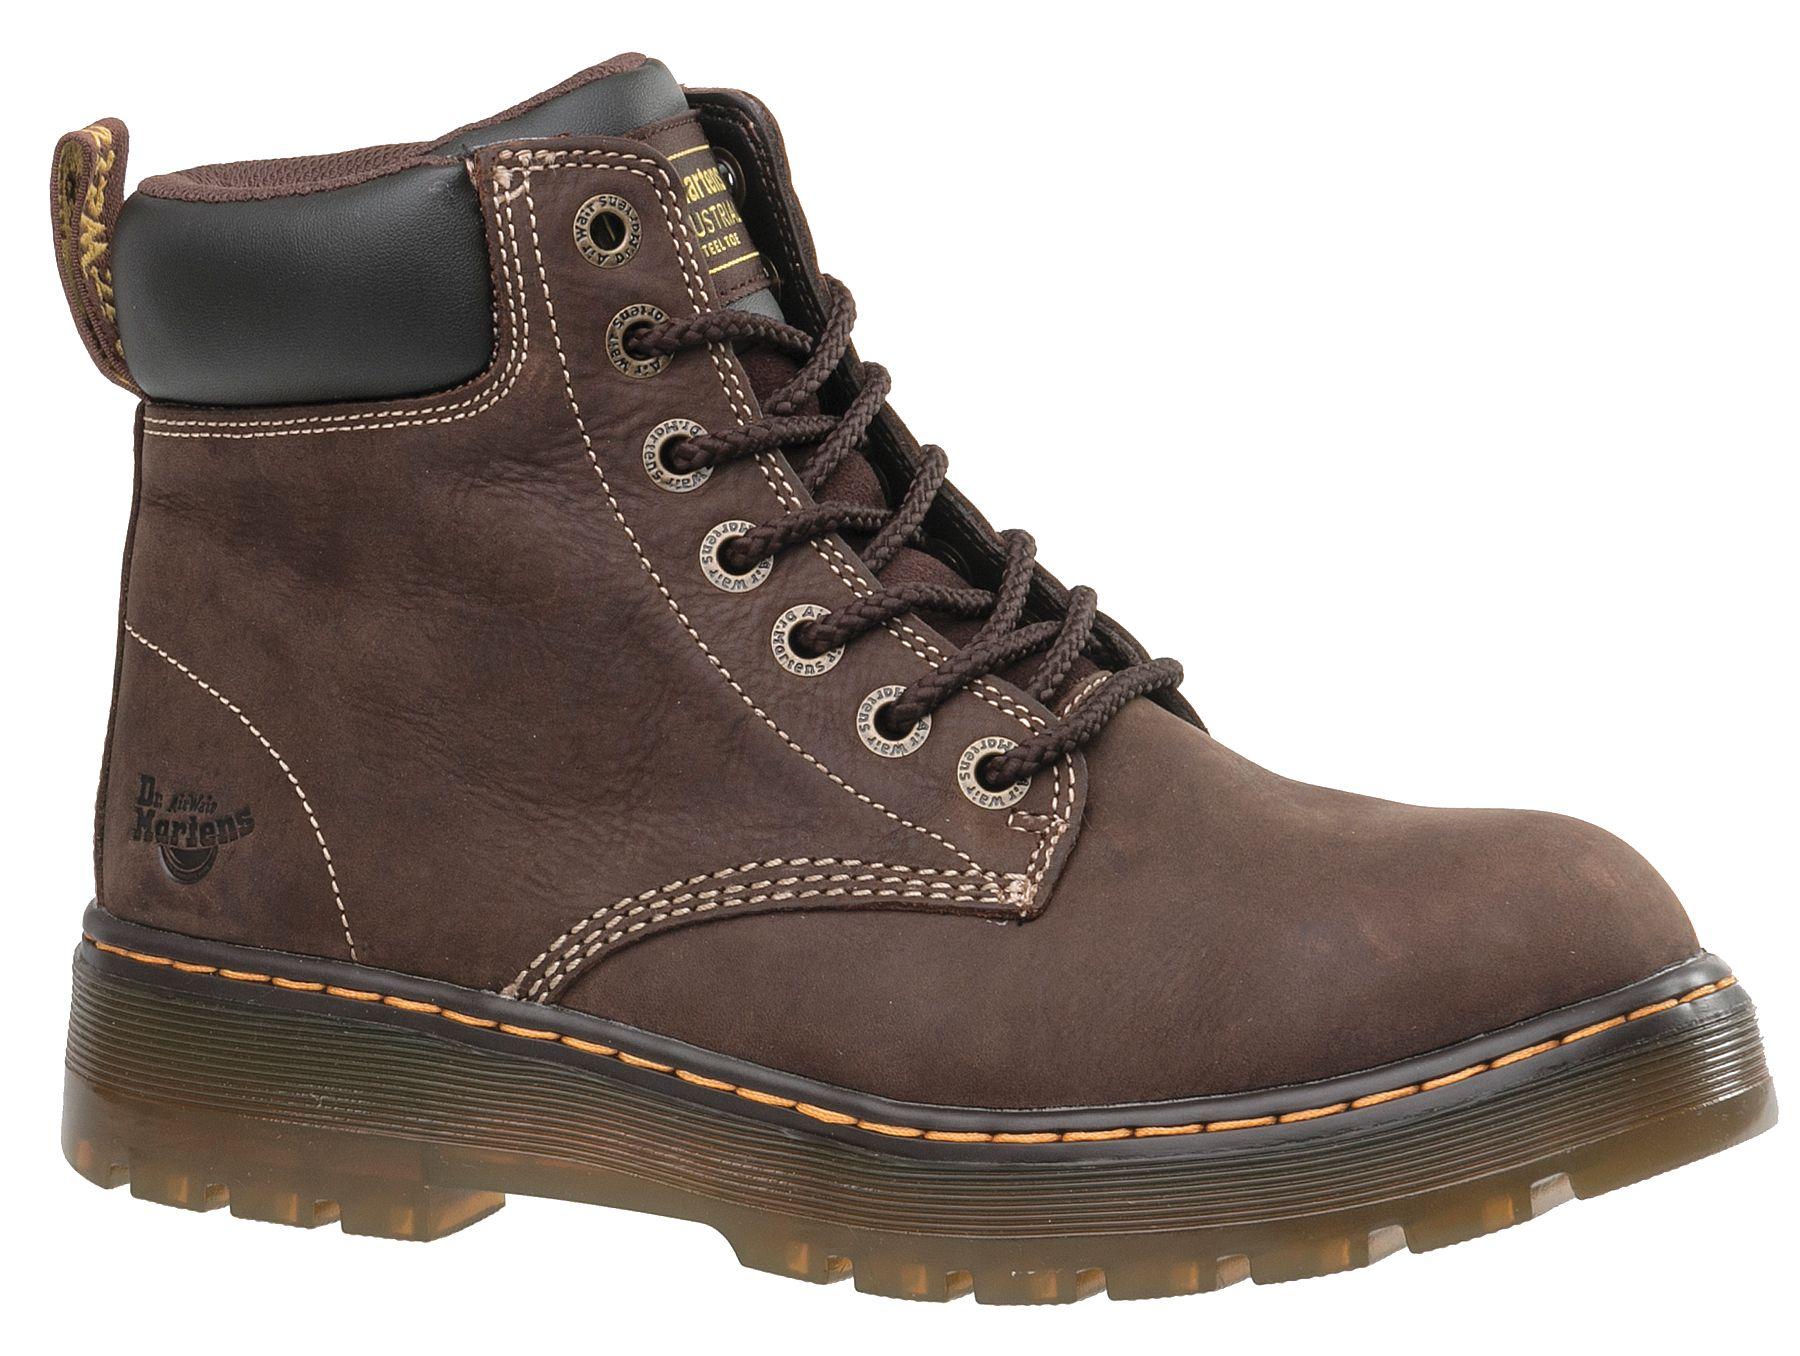 H,Mens,Brown,11,M,PR DR MARTENS R16258201 Work Boots,6 in